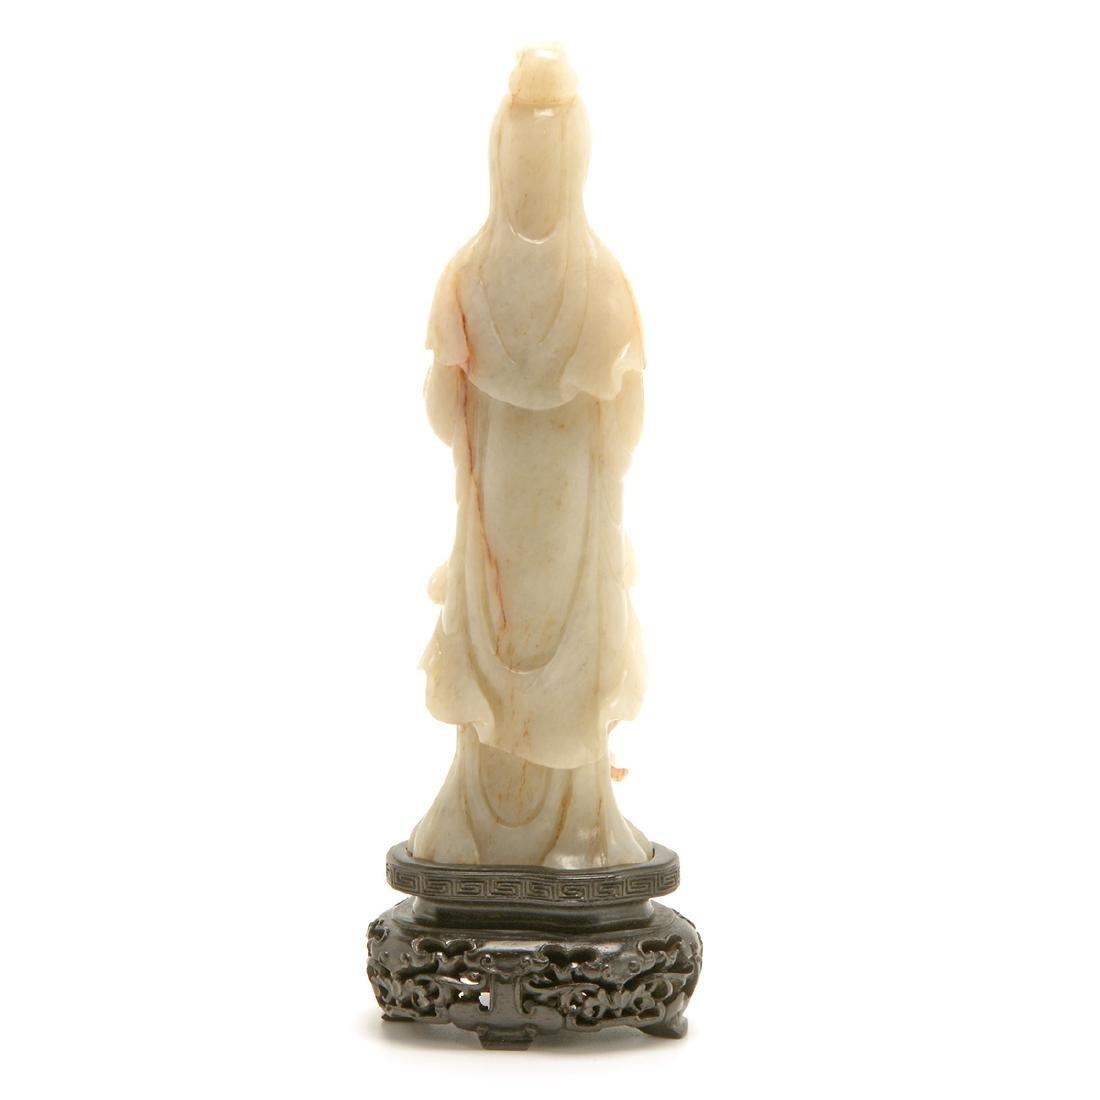 Jade Figure of Guanyin, Late Qing/Republic Period - 3